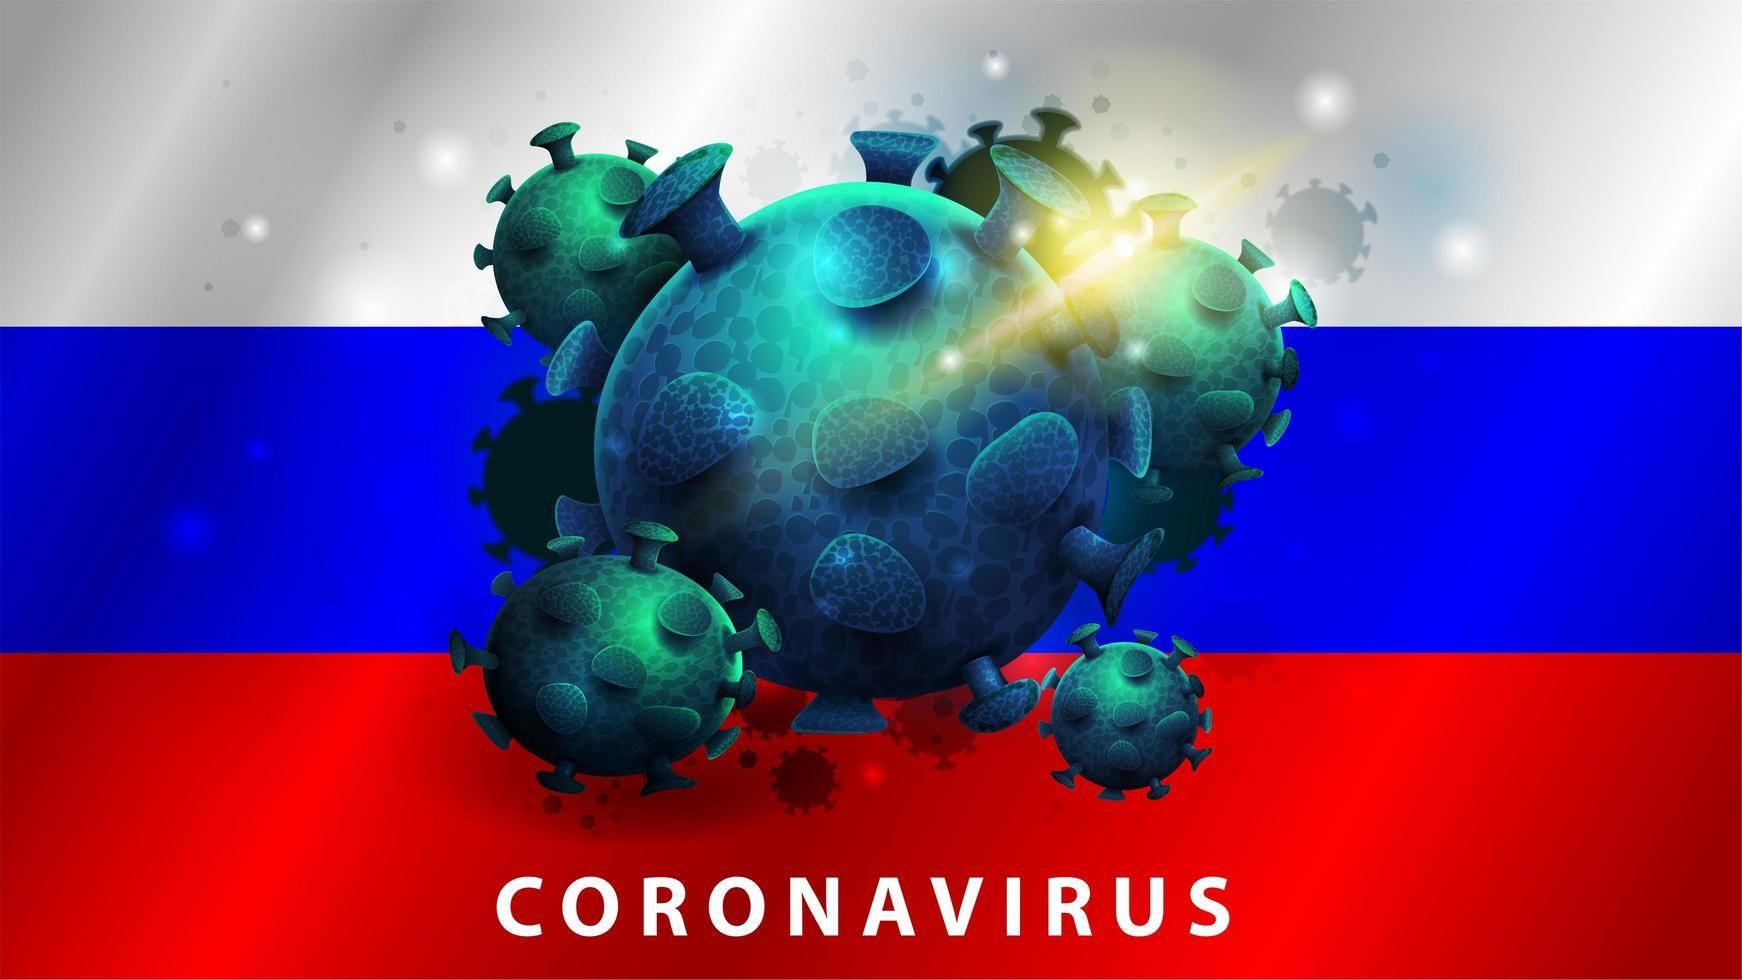 sinal do coronavírus covid-2019 na bandeira da Rússia vetor